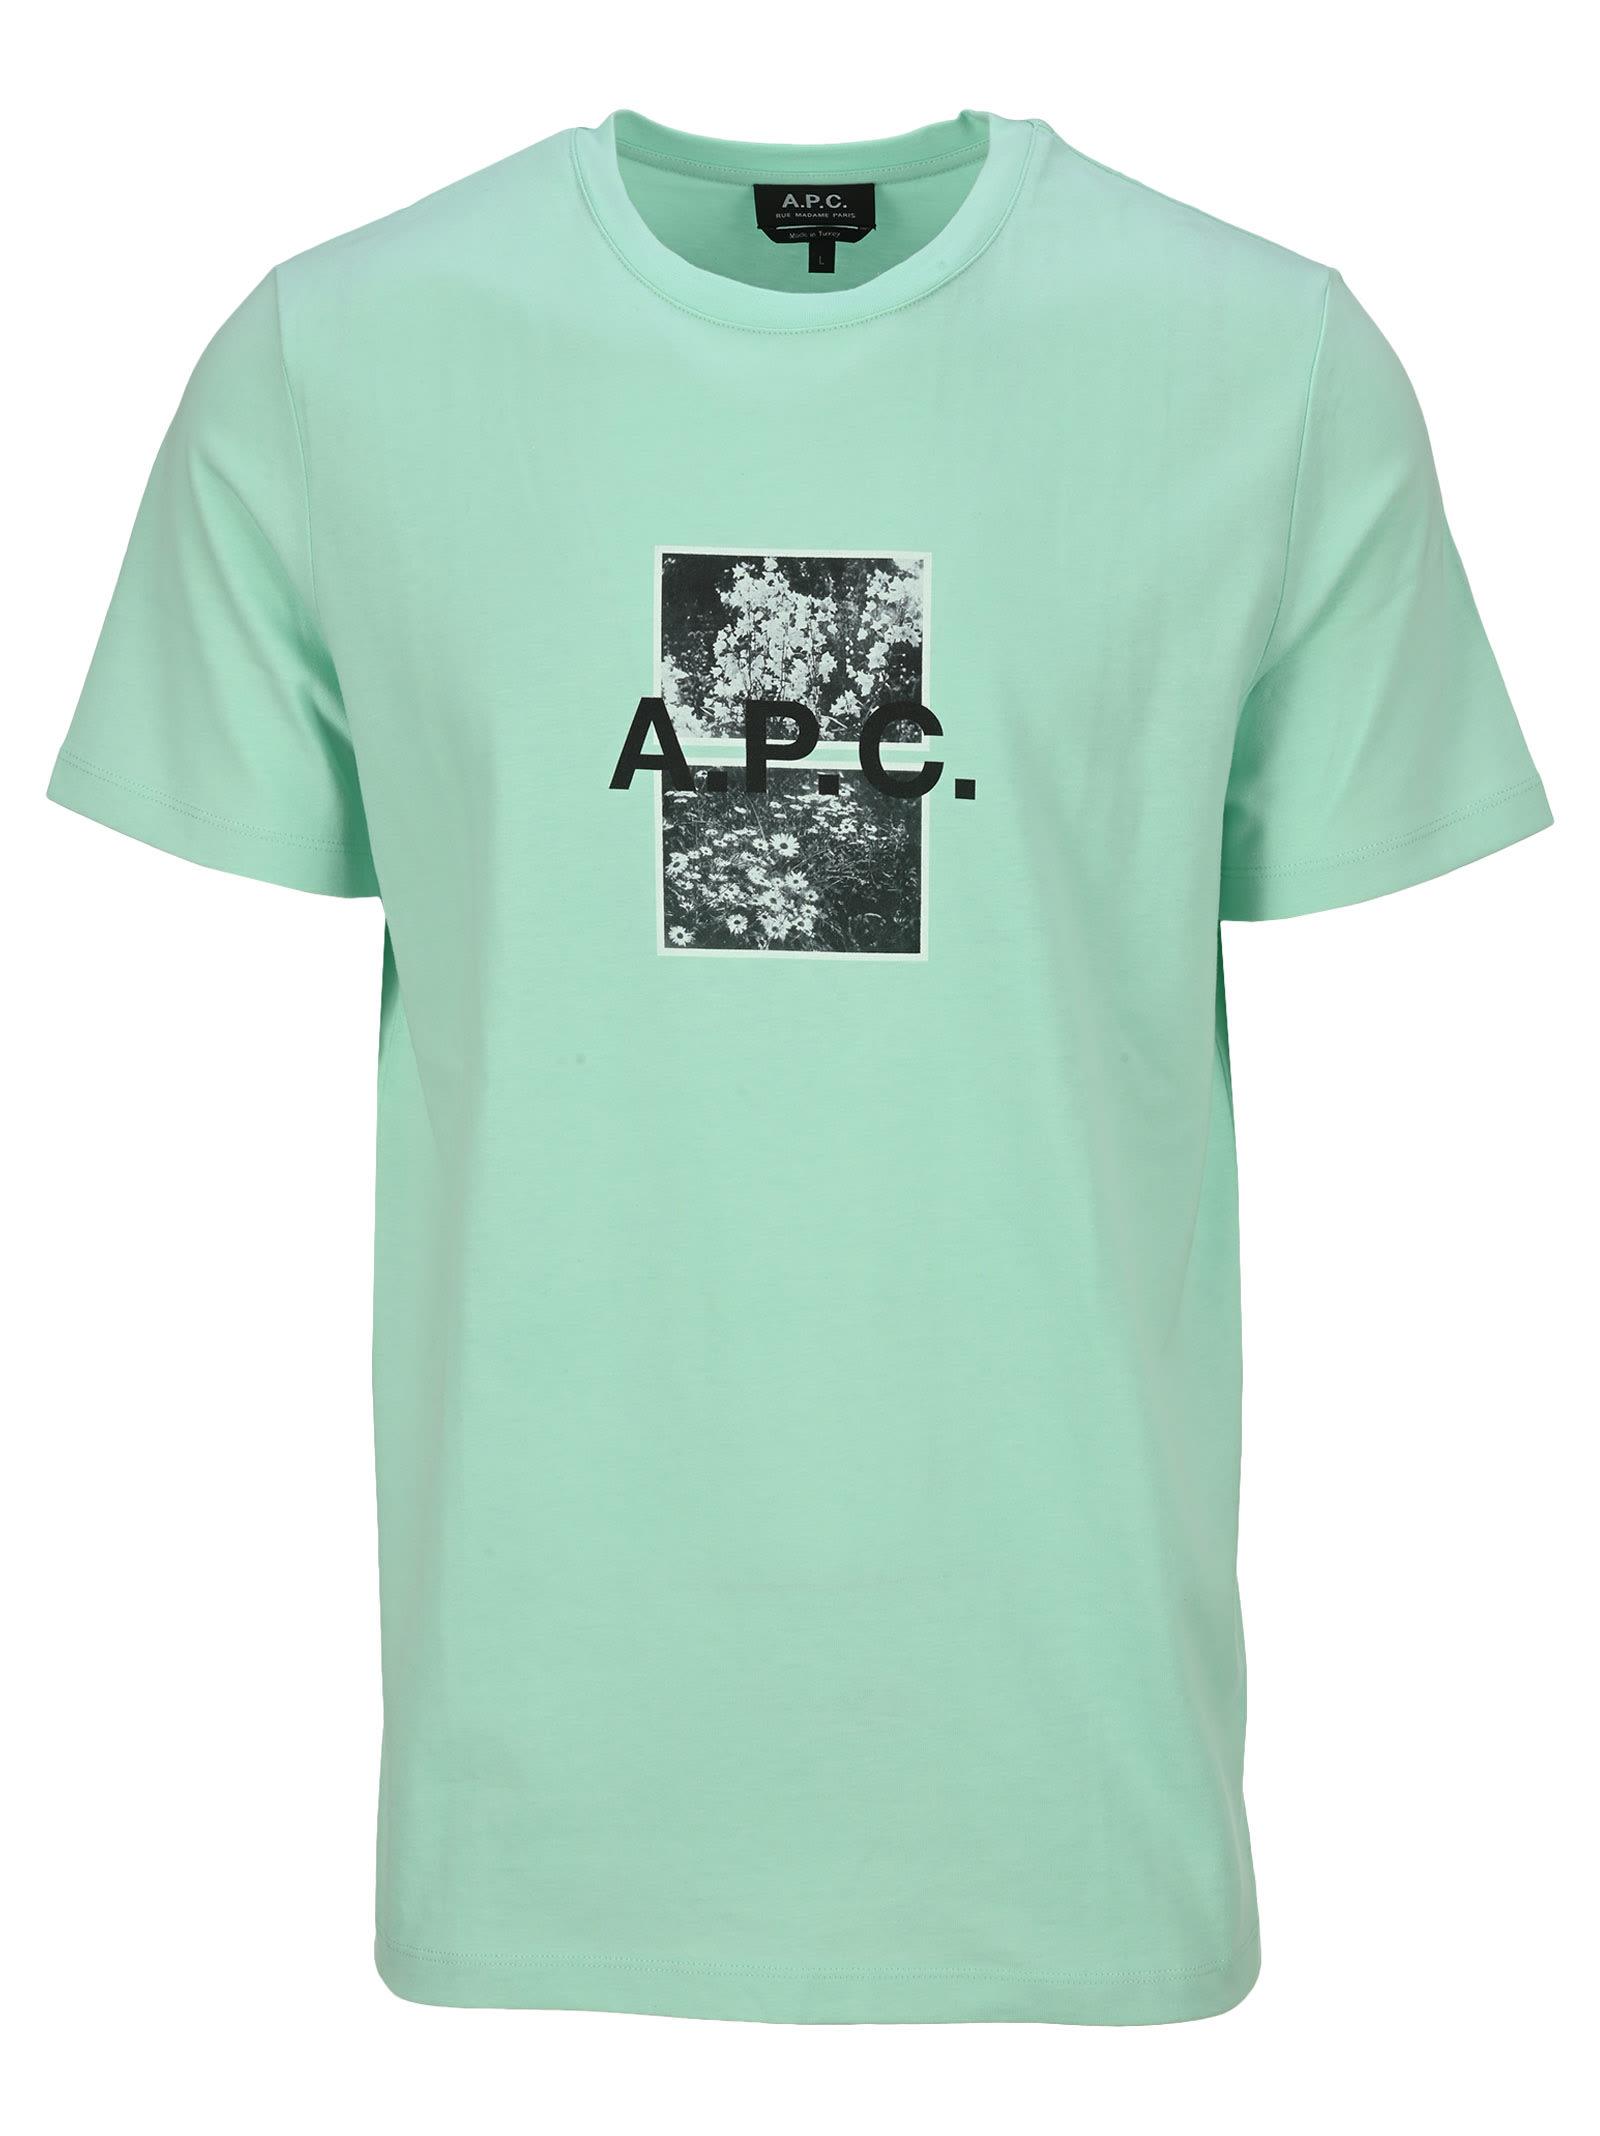 A.p.c. Teddy T-shirt